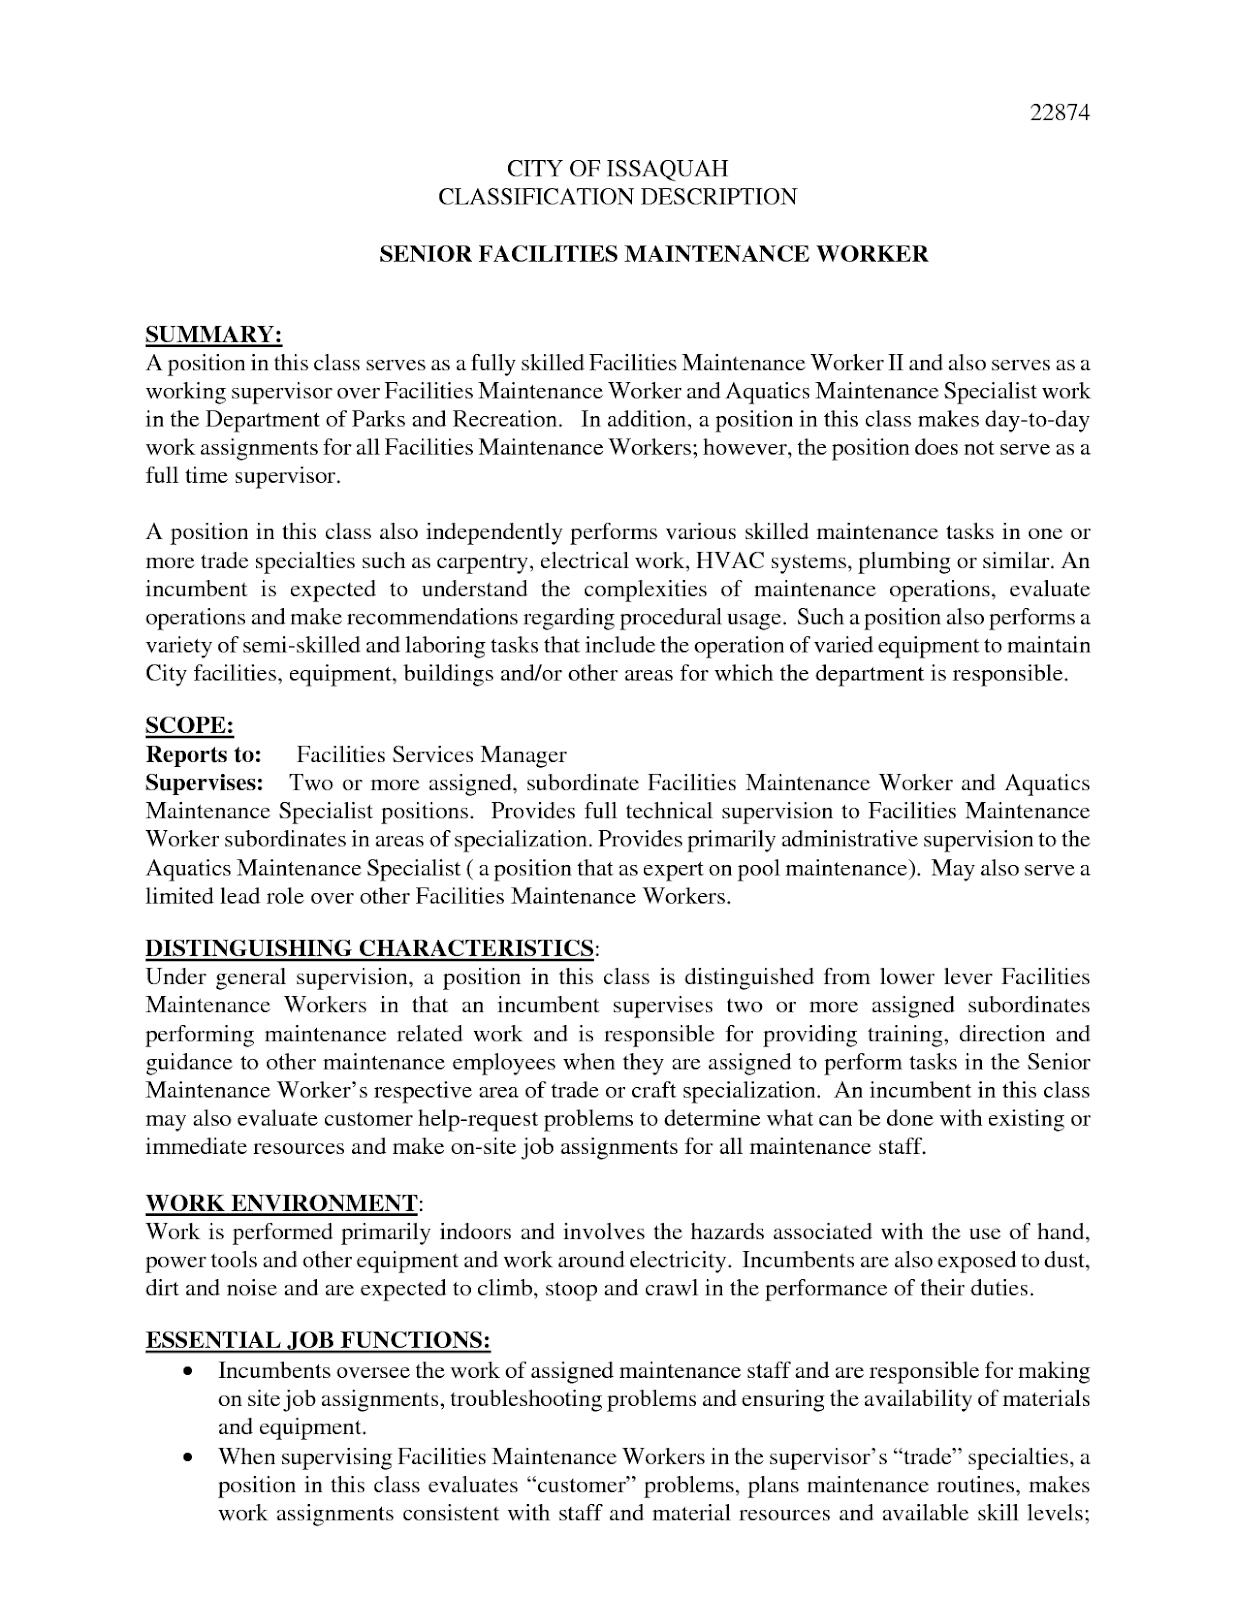 Maintenance Man Resume Sample 2019 Maintenance Man Resume Objective 2020 Maintenance Man Resume Objective Maintena Resume Objective Resume Best Resume Template